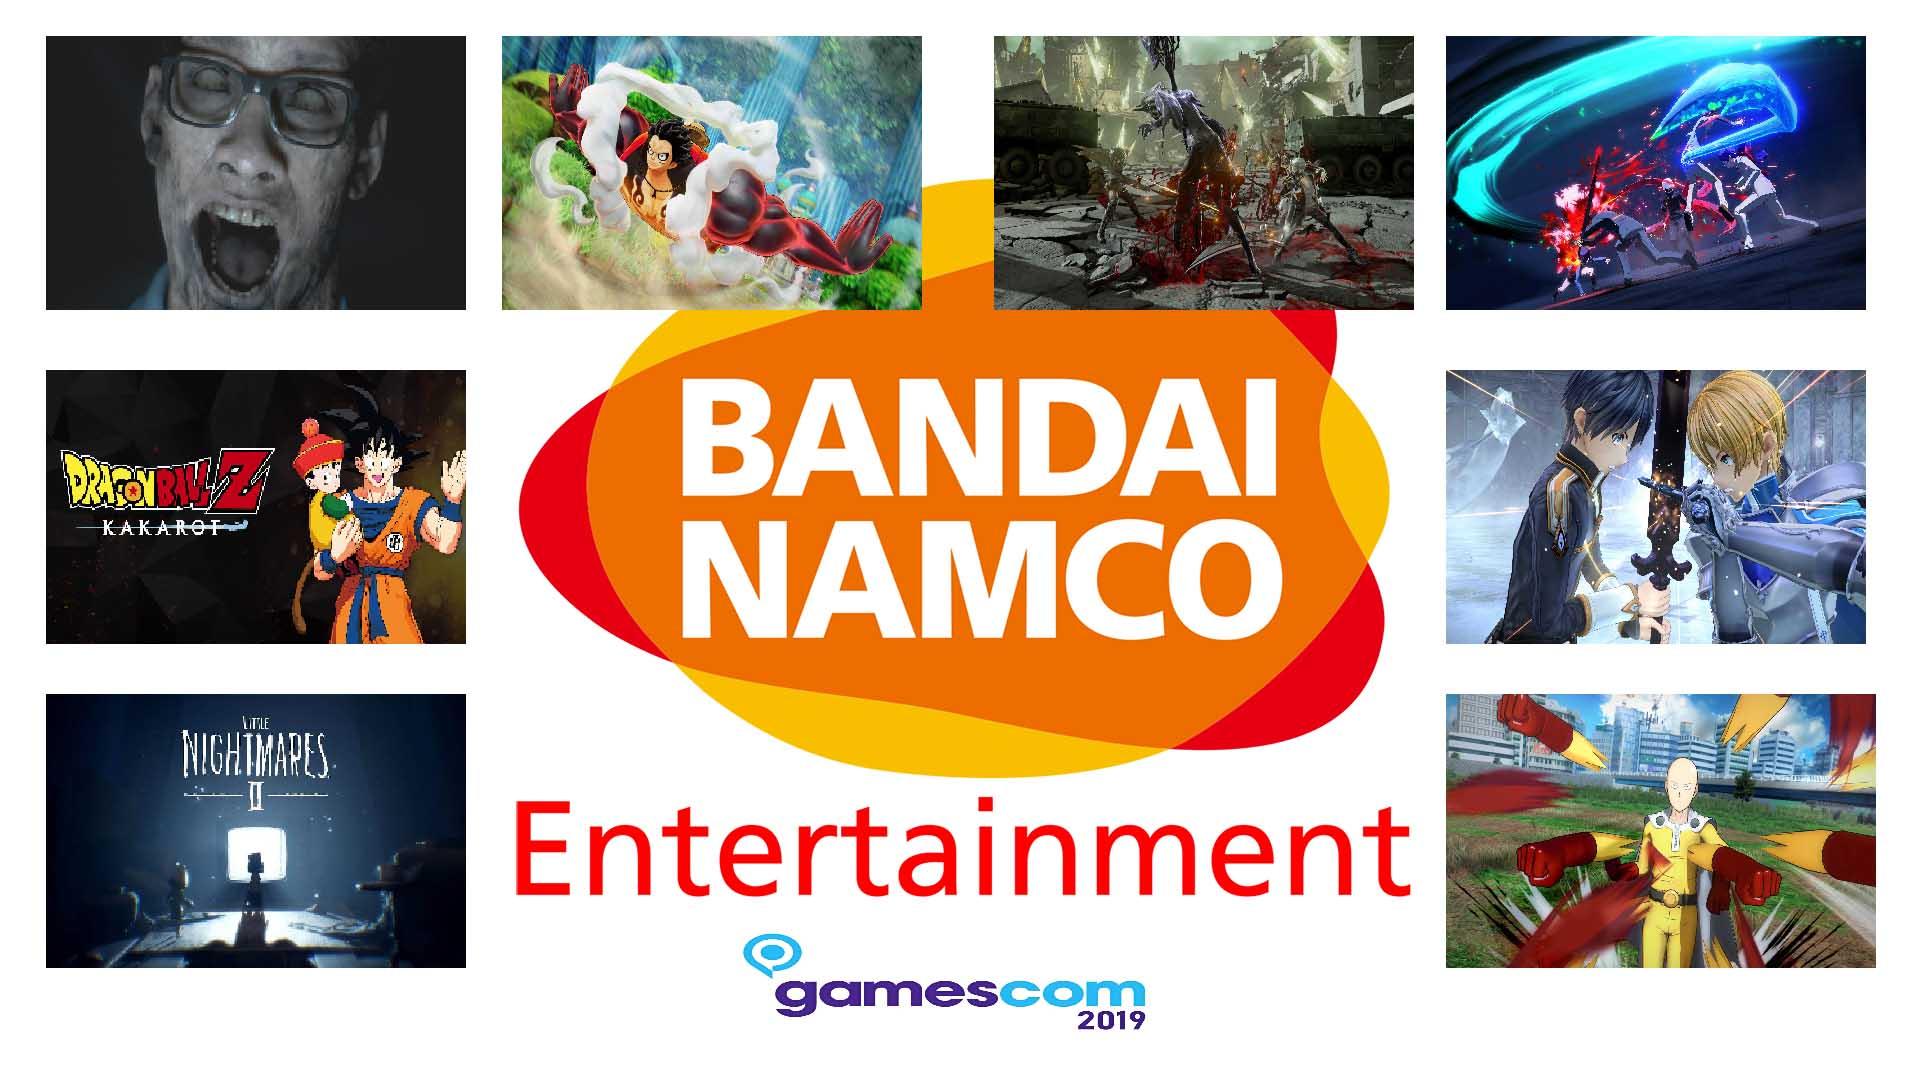 bandai namco entertainment gamescom 2019